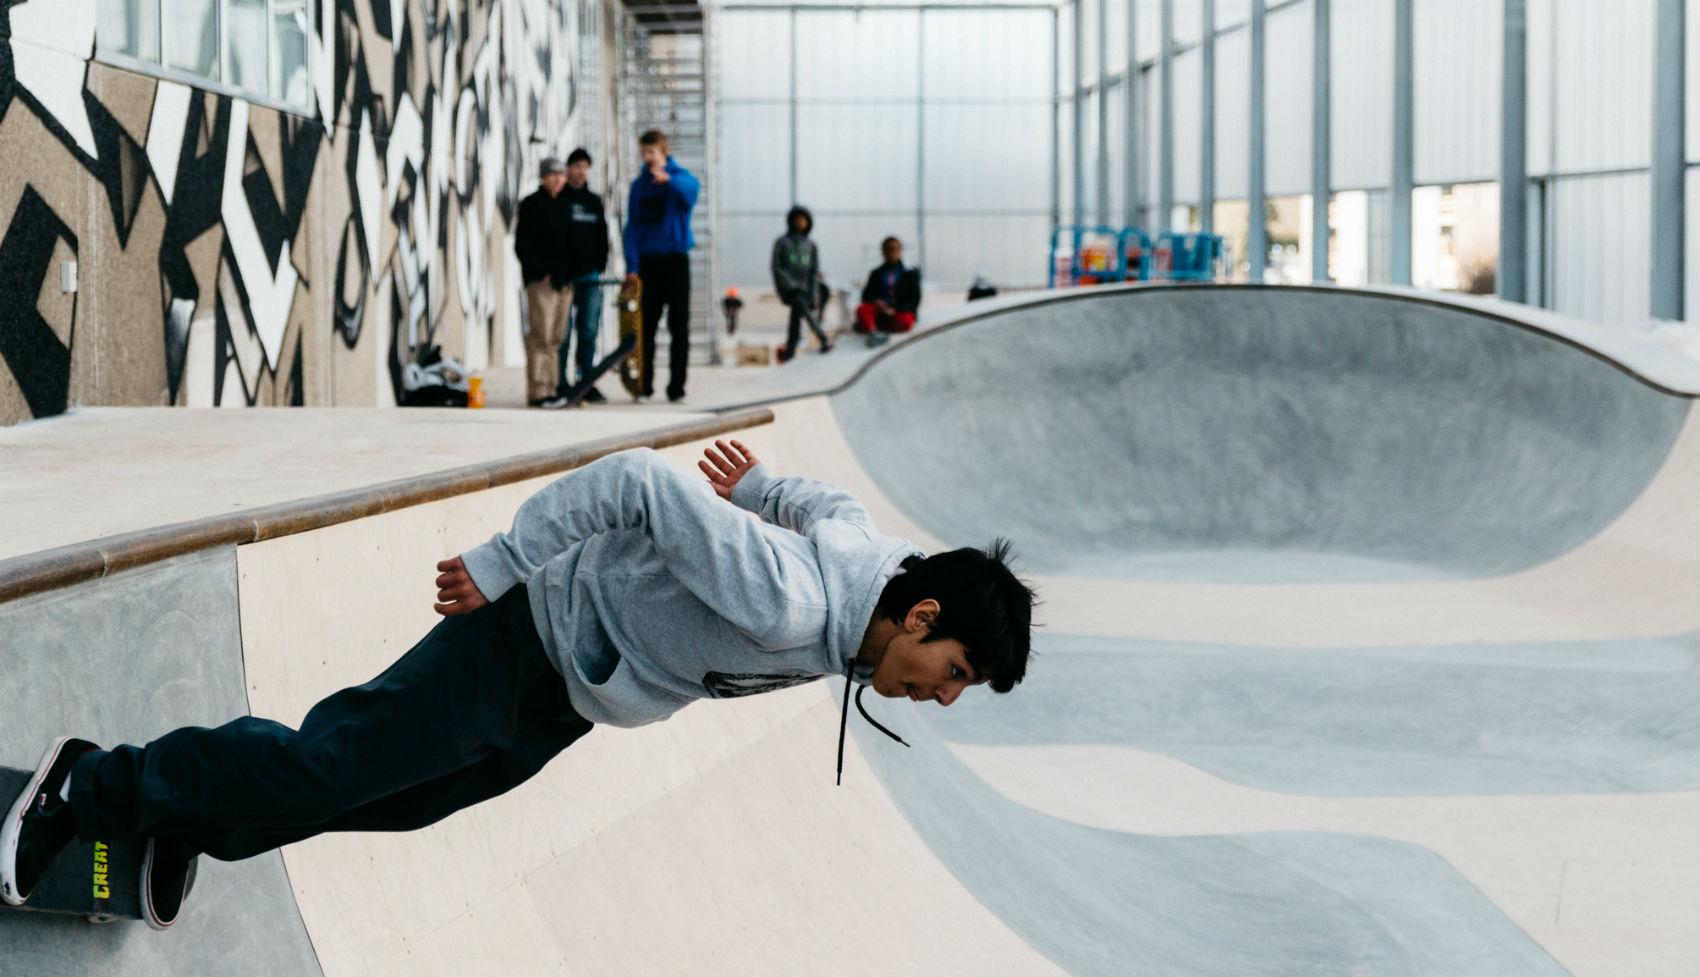 Game Streetmekka Viborg Rehabilitación Arquitectura Urbana